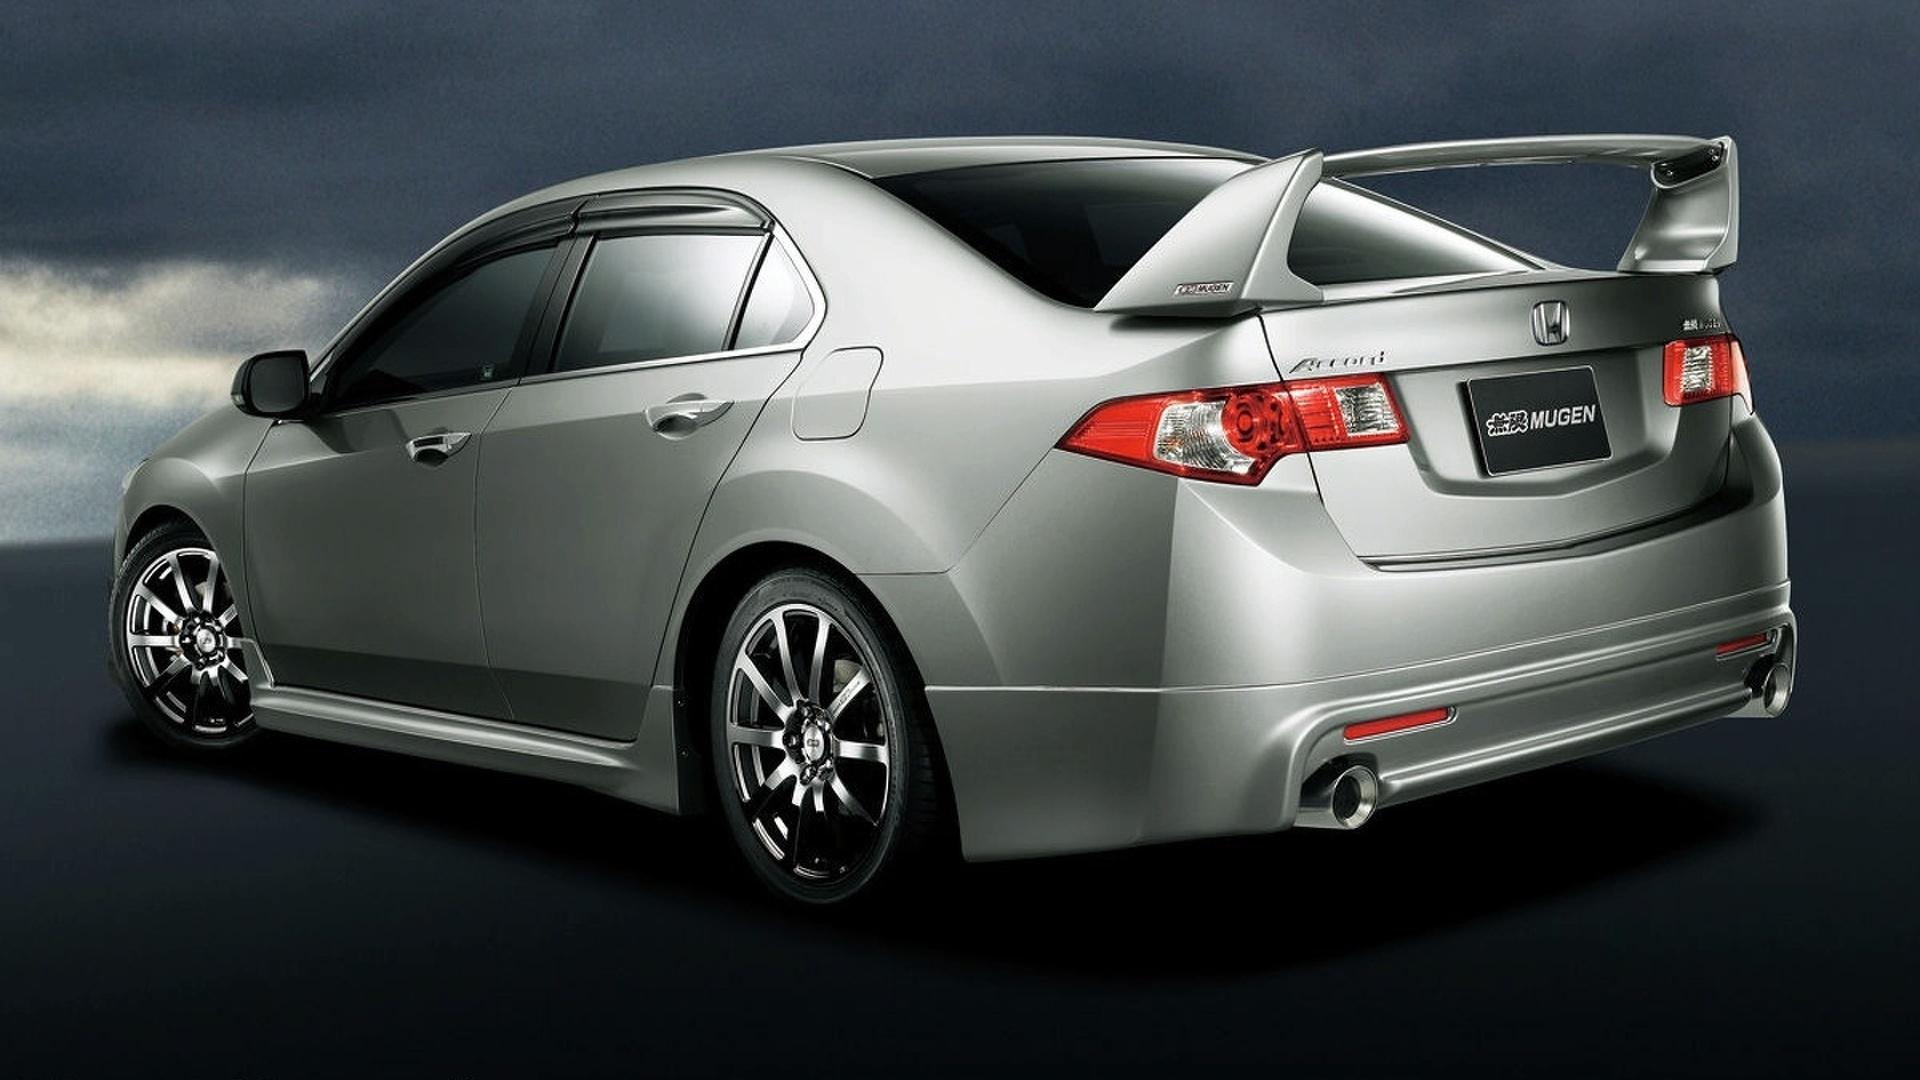 New Honda Accord Receives Mugen Treatment in Japan